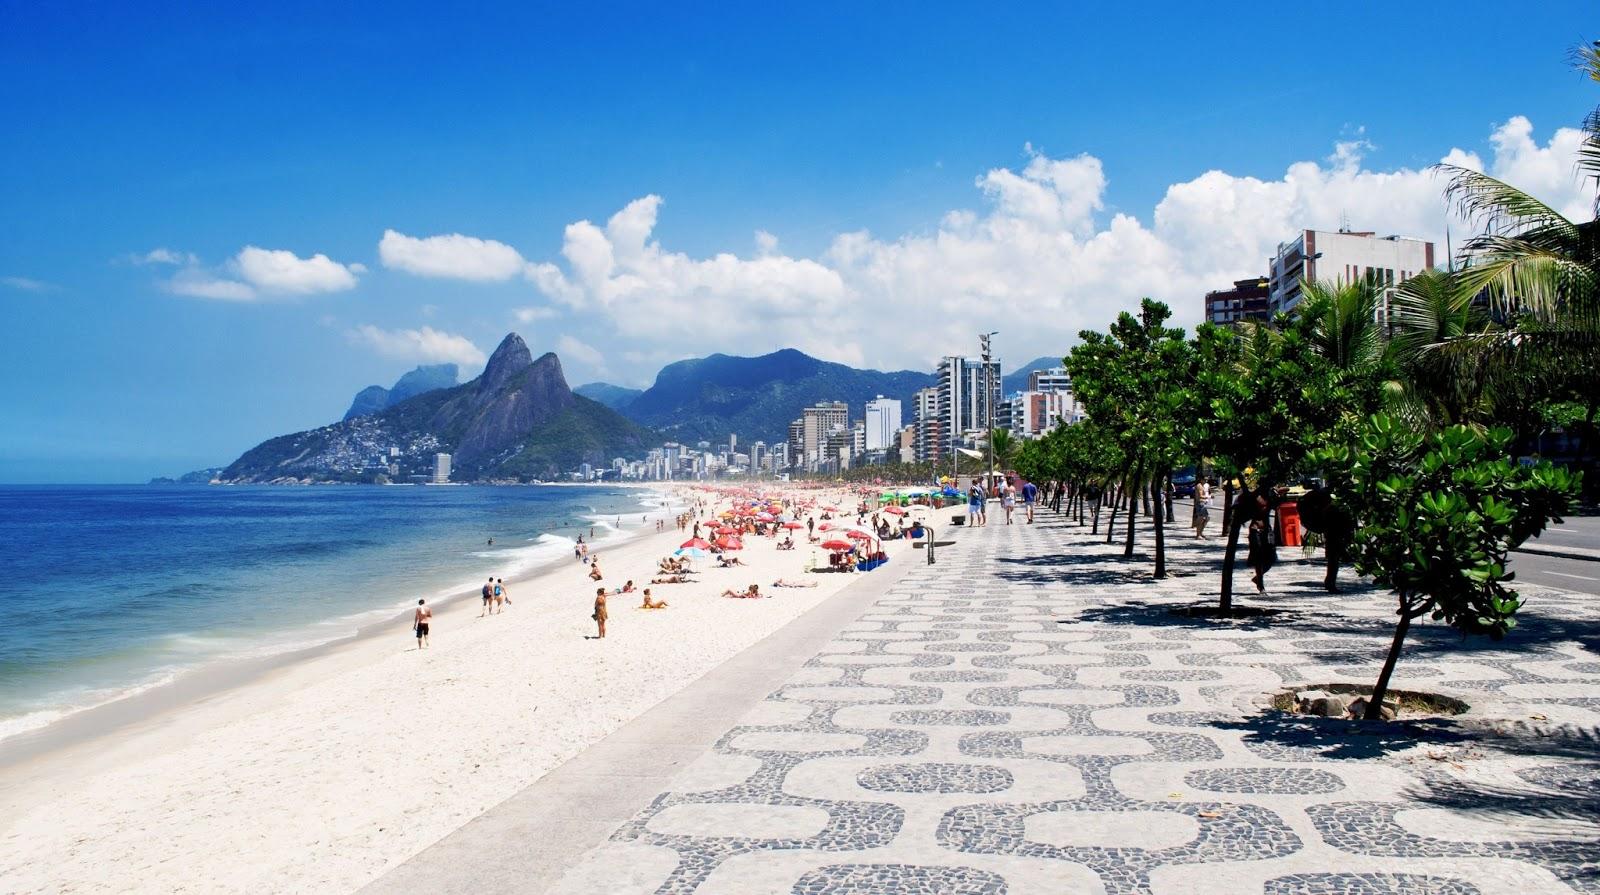 Hotels In Ipanema Rio De Janeiro Brazil